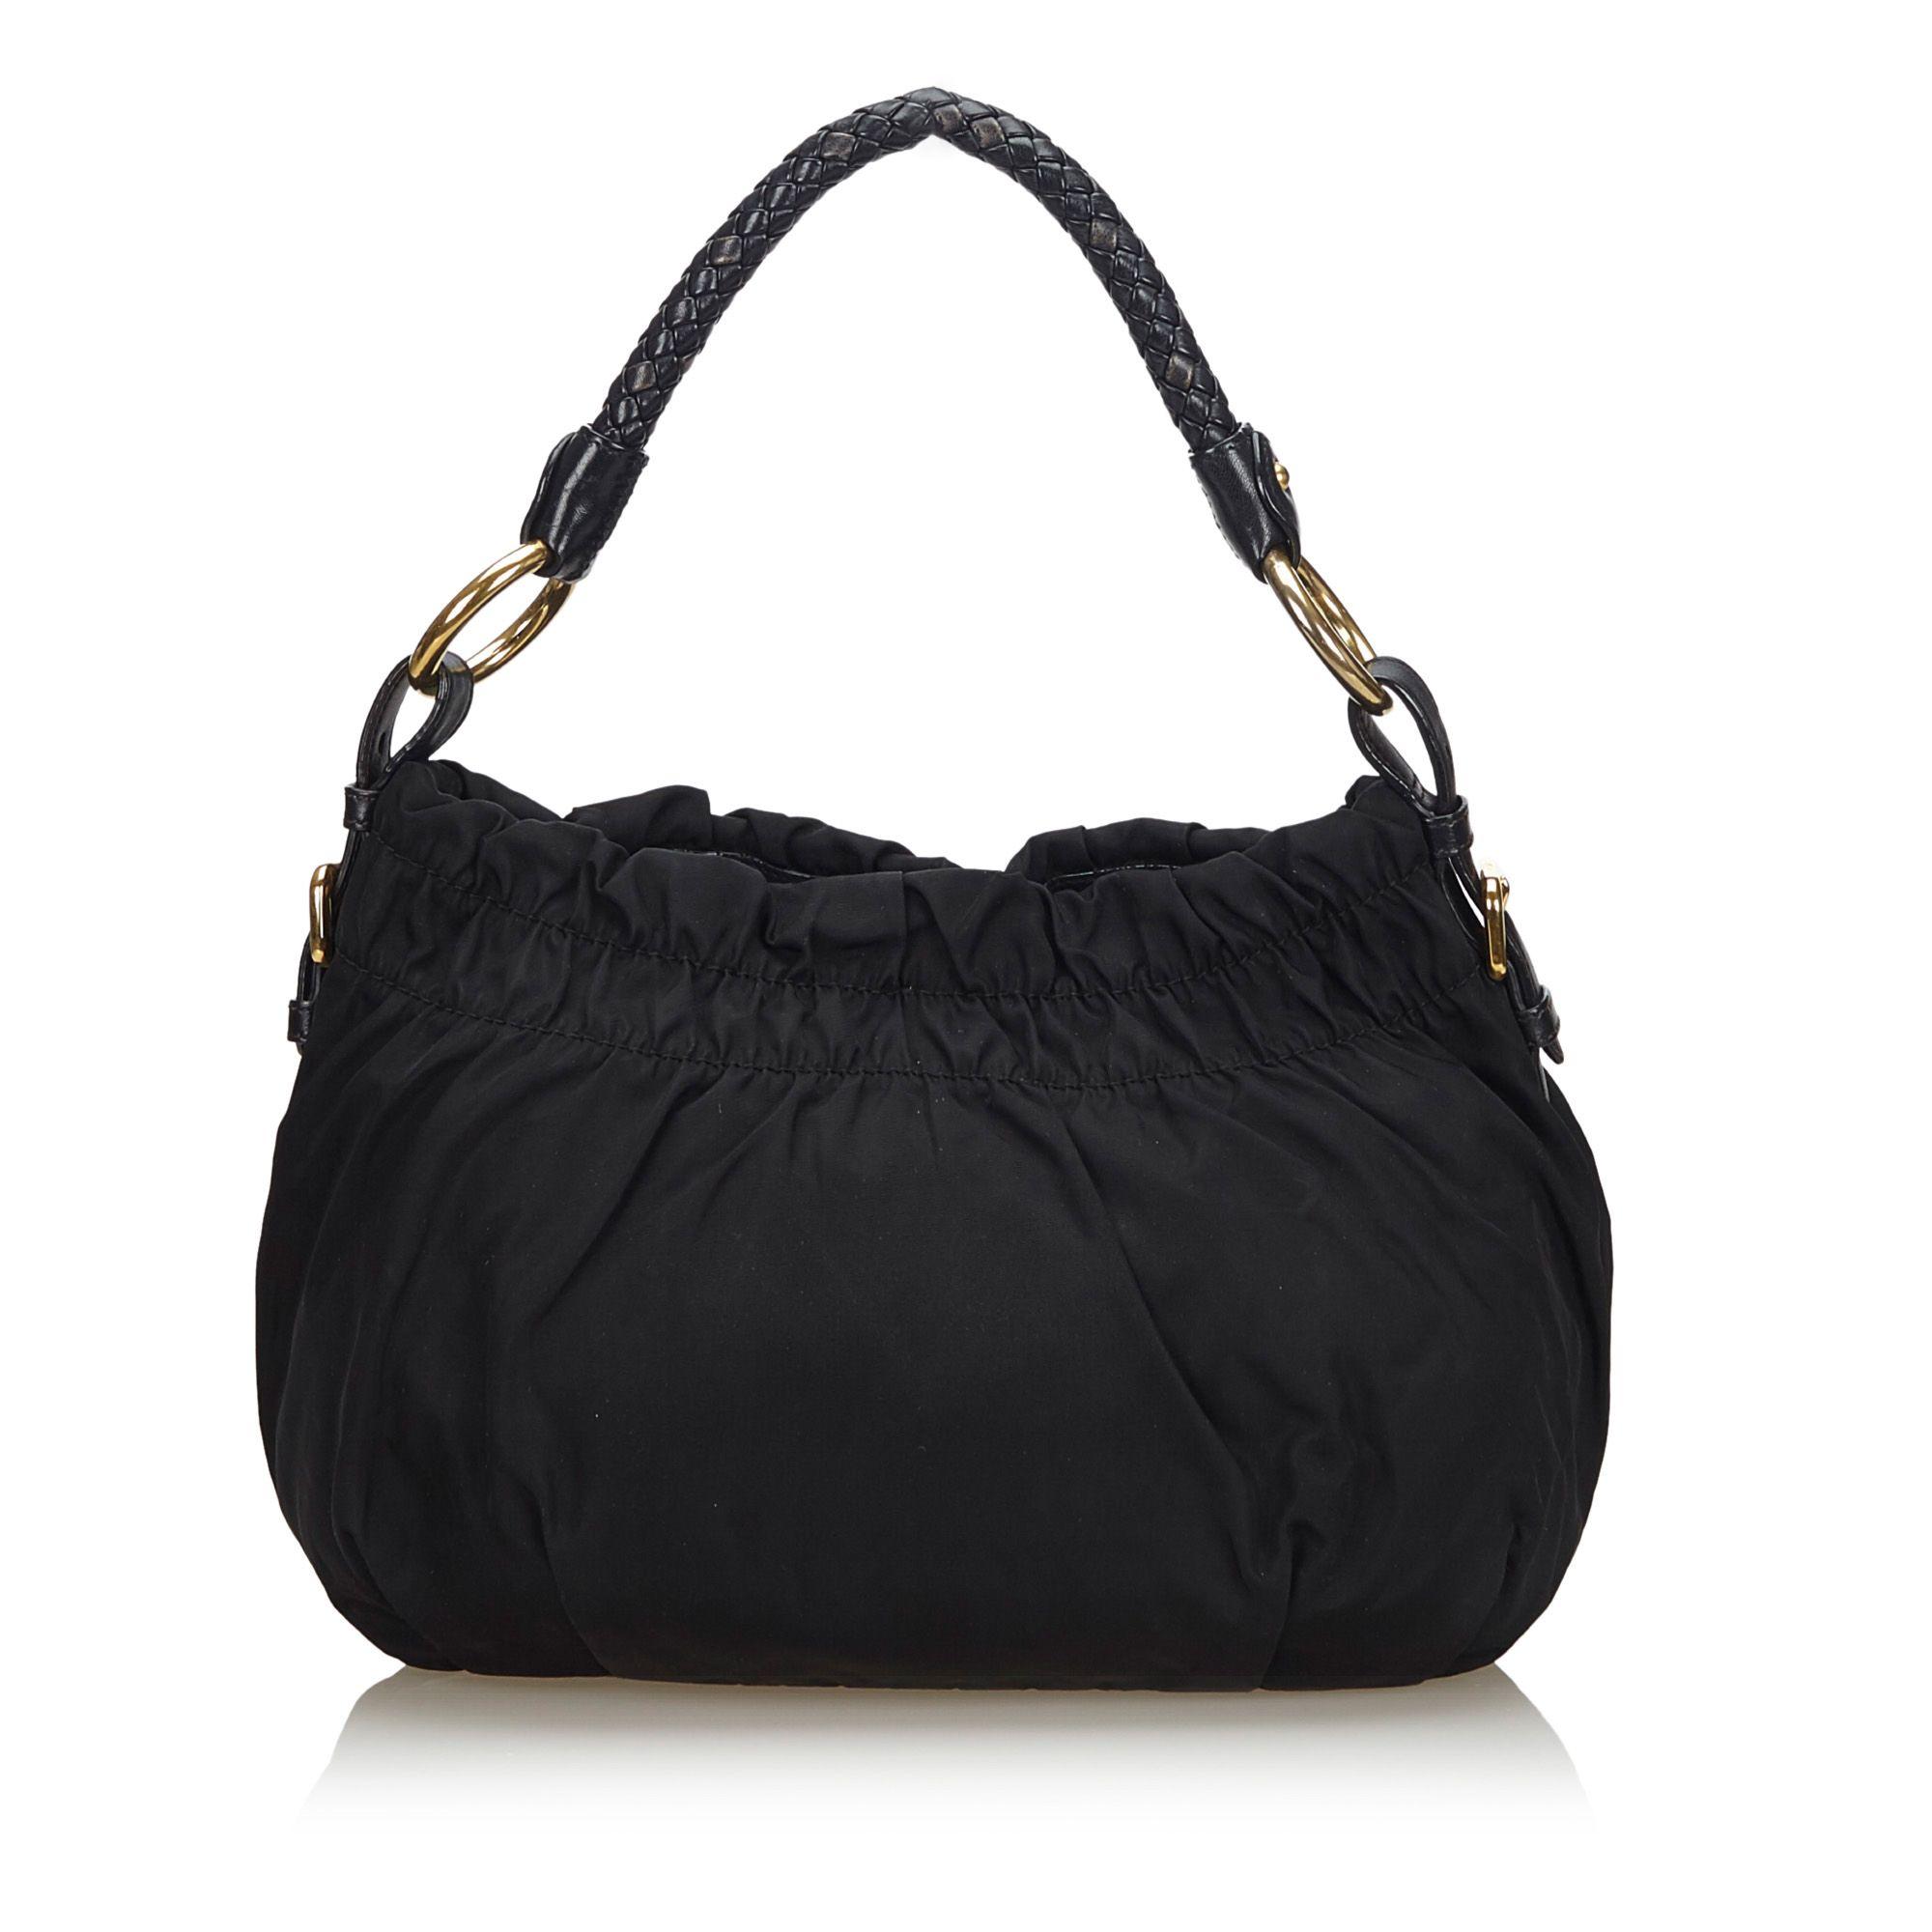 Vintage Prada Gathered Nylon Handbag Black